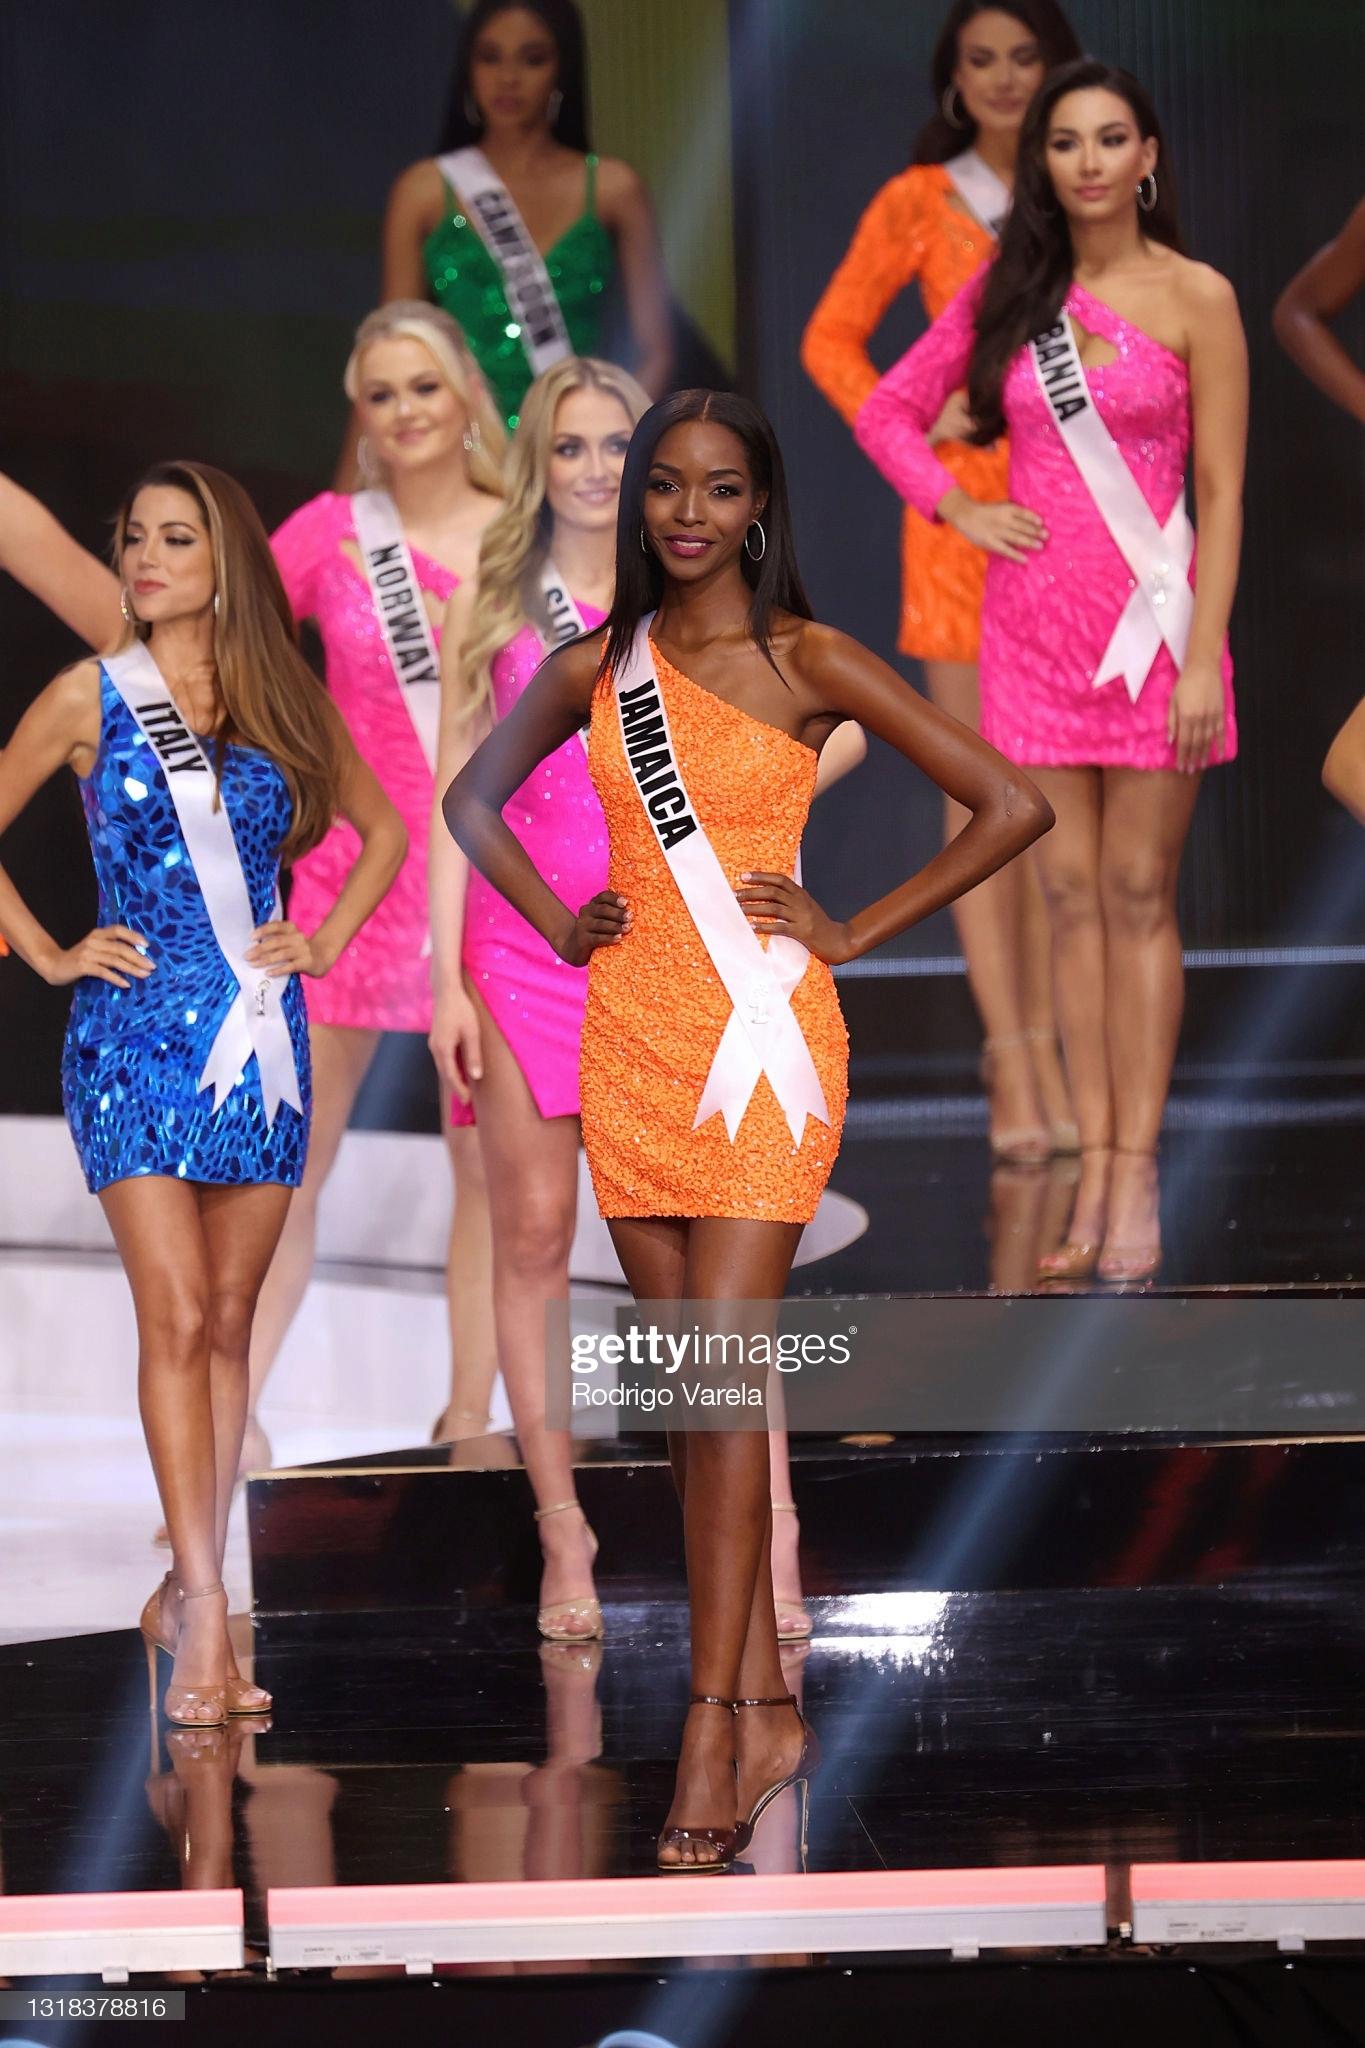 miqueal-symone williams, top 10 de miss universe 2020. - Página 9 20877411